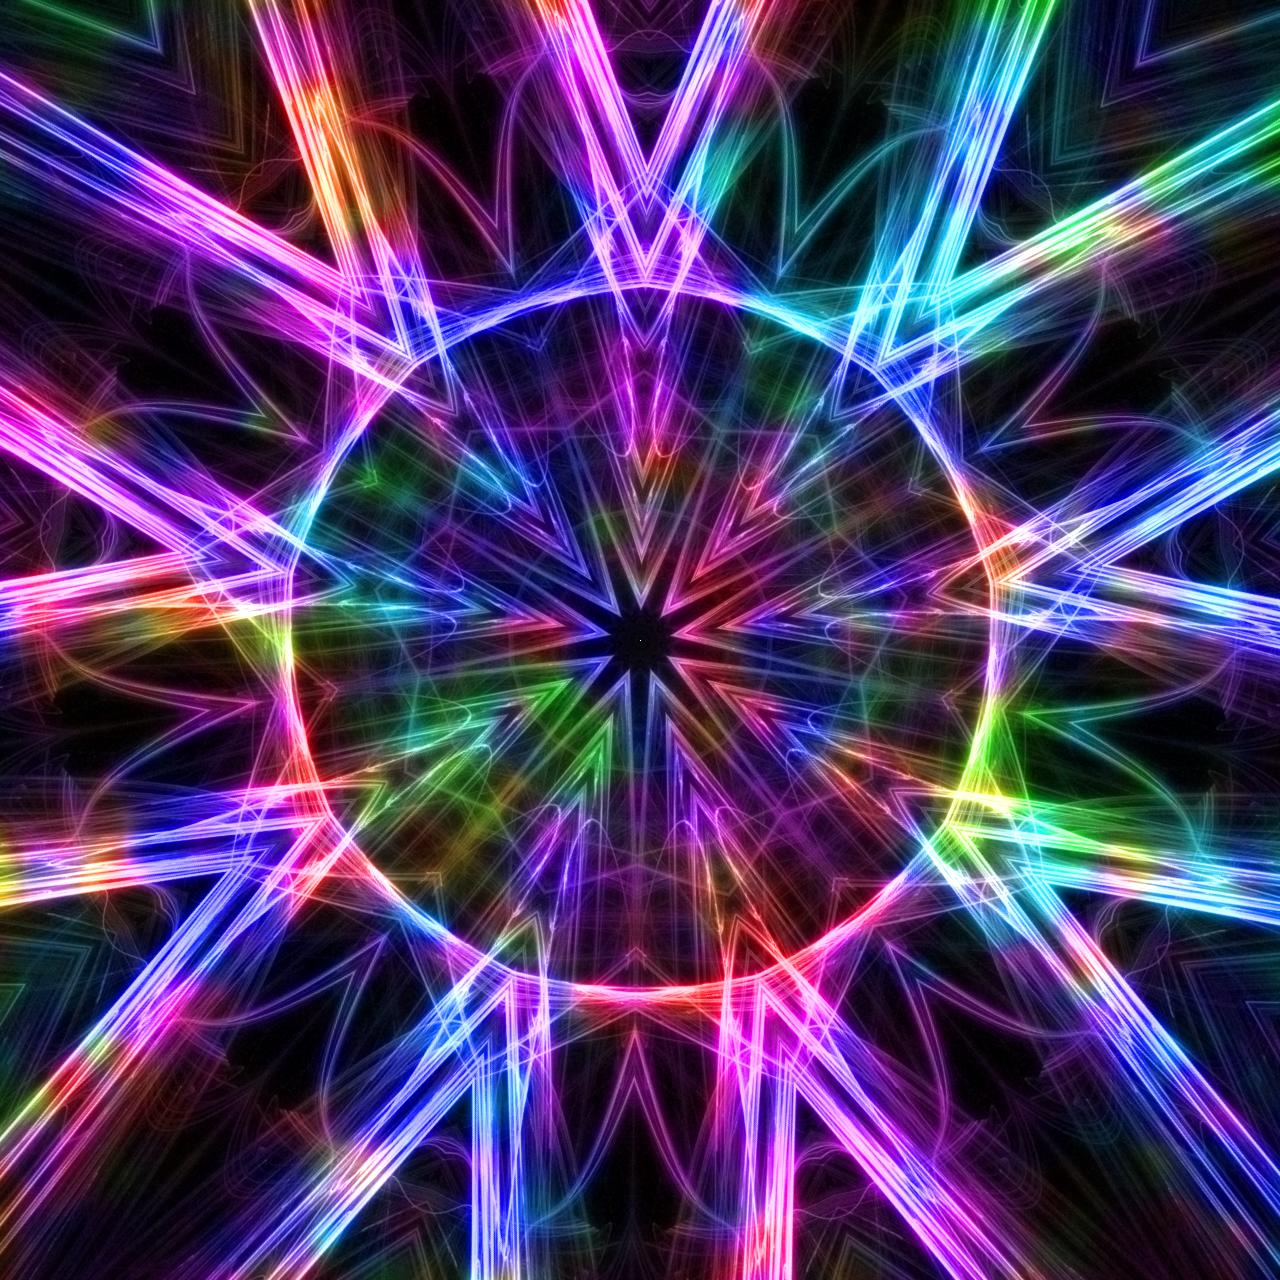 Kaleidoscope 4 by huntercobb98